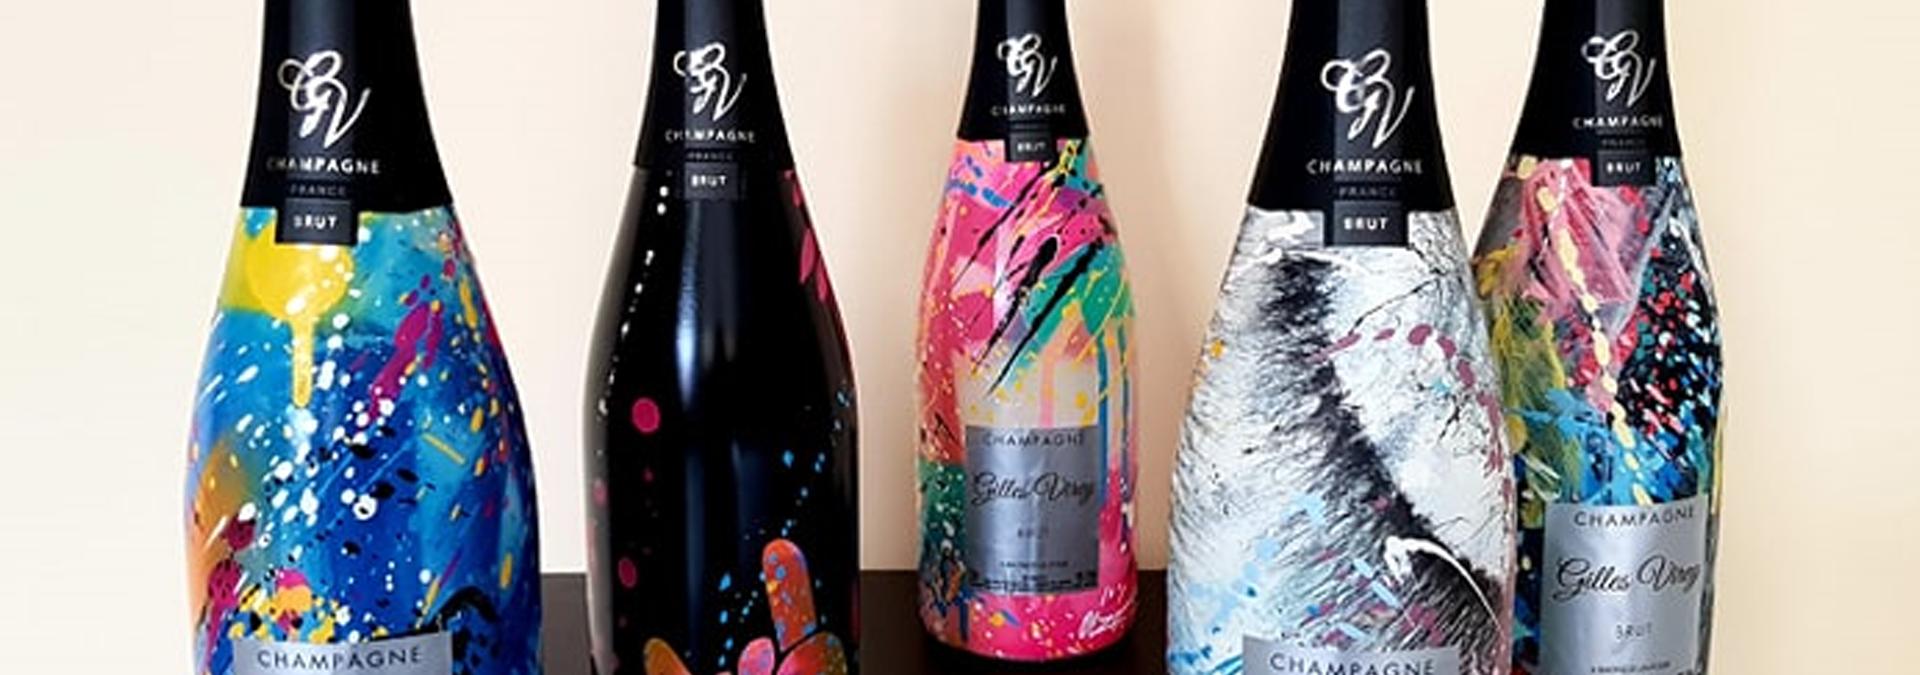 Champagne Gilles Virey